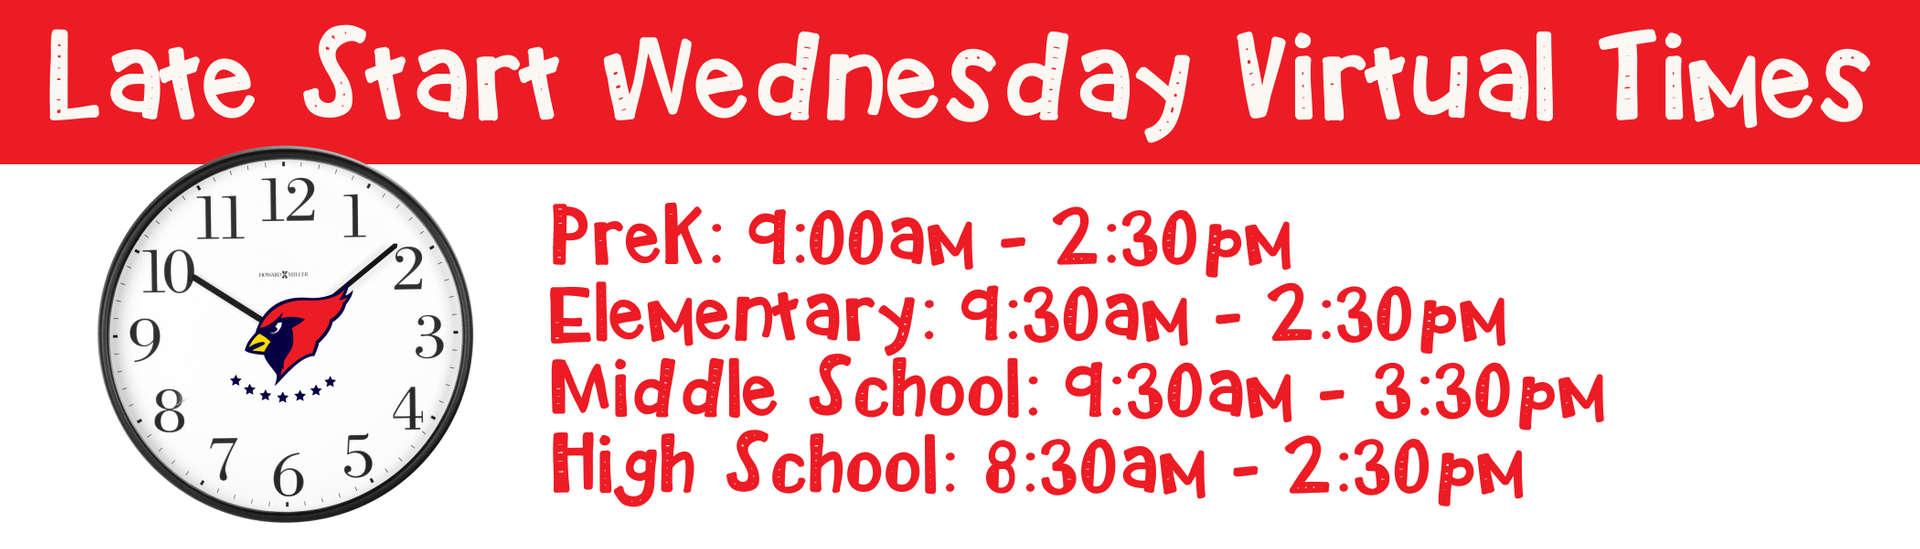 Late Start Wednesday start times